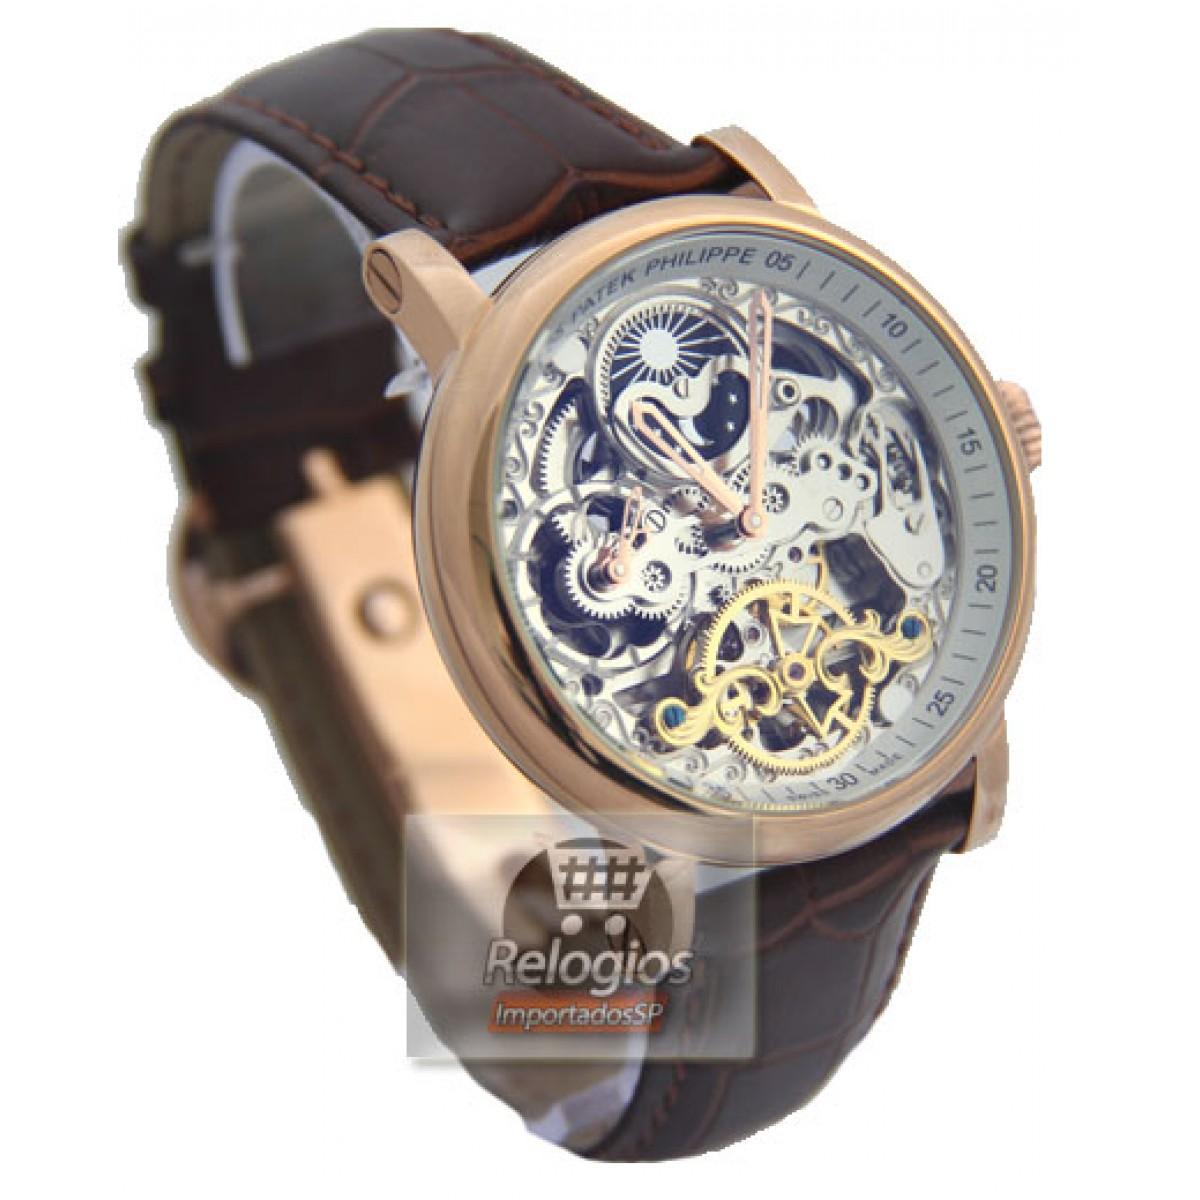 b0395d9b1b4 Relógio Réplica Patek Philippe Esquelete Marrom